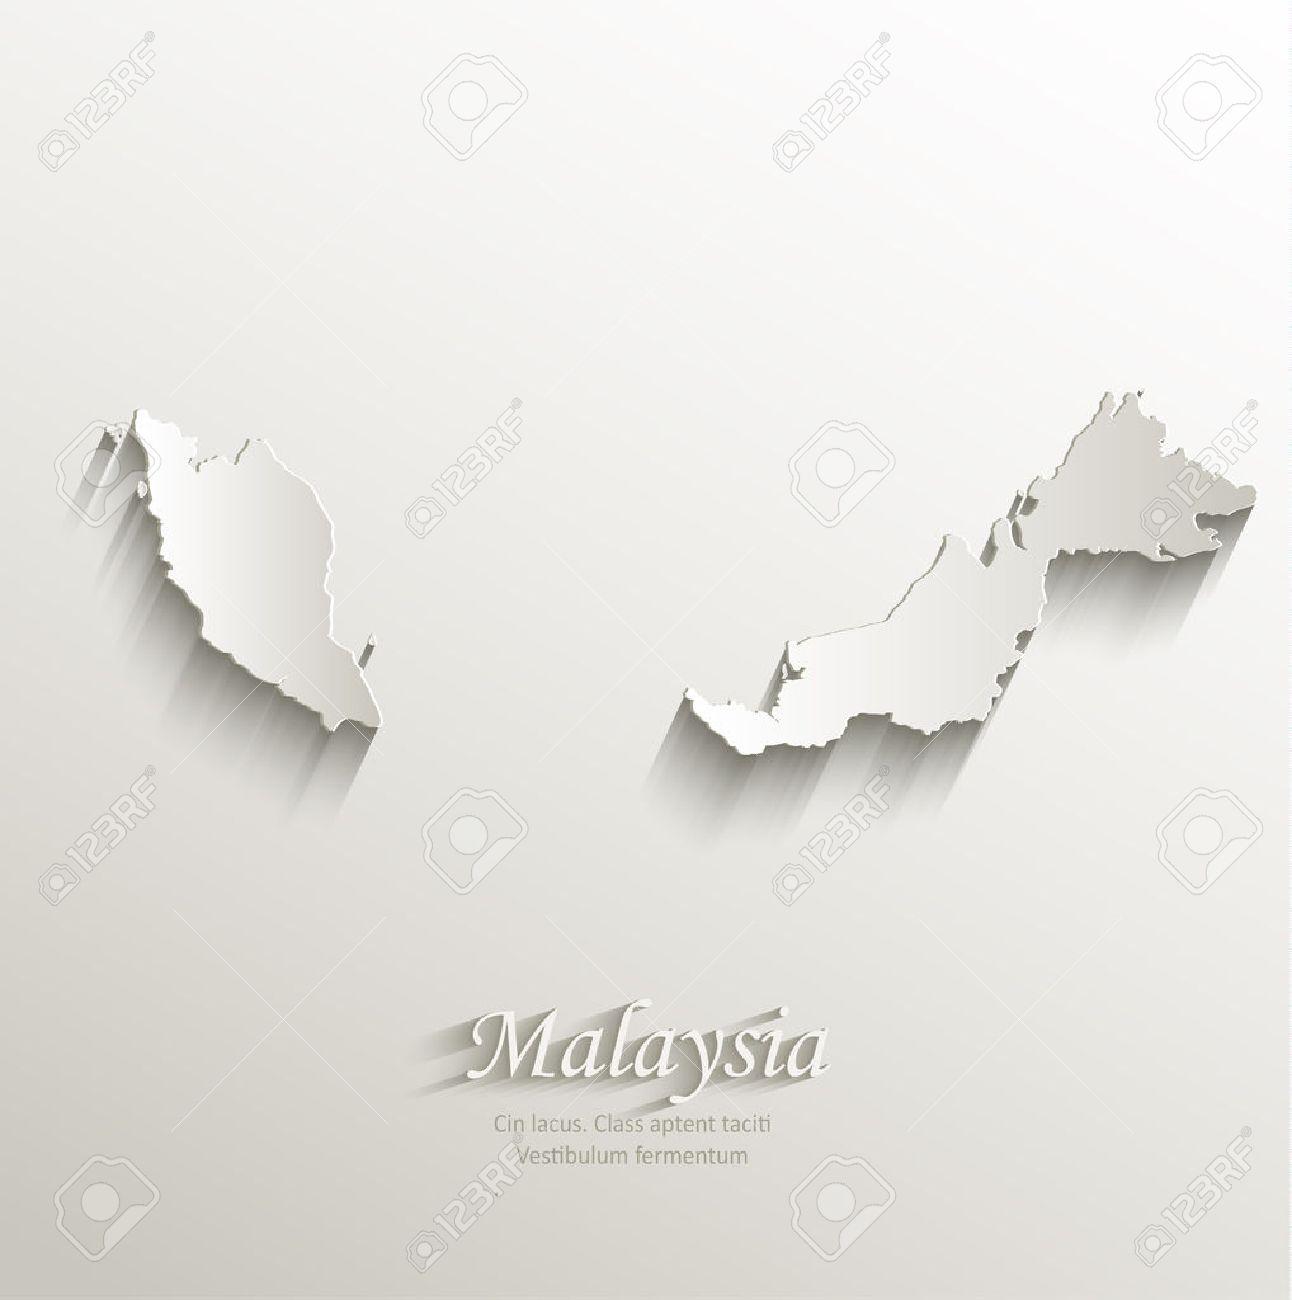 Malaysia Map Card Paper 3D Natural Vector Royalty Free Cliparts